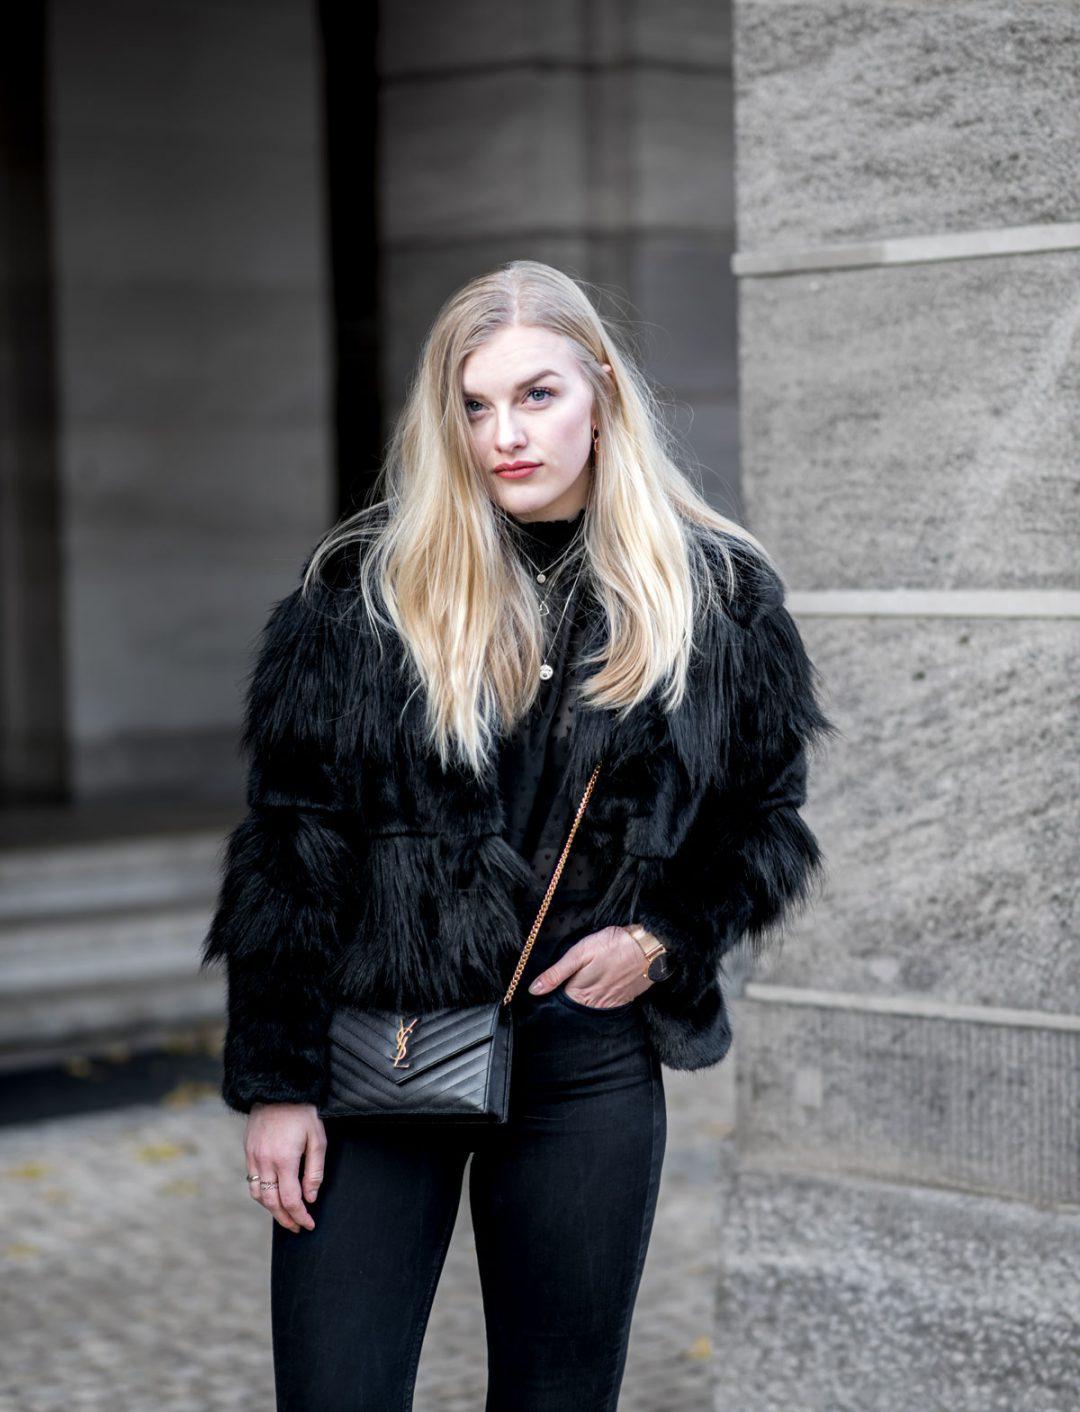 Eva-Jasmin-Designer-Bags-Luxus-Money-Geld-Studium-Privatuni-Studiengebühren